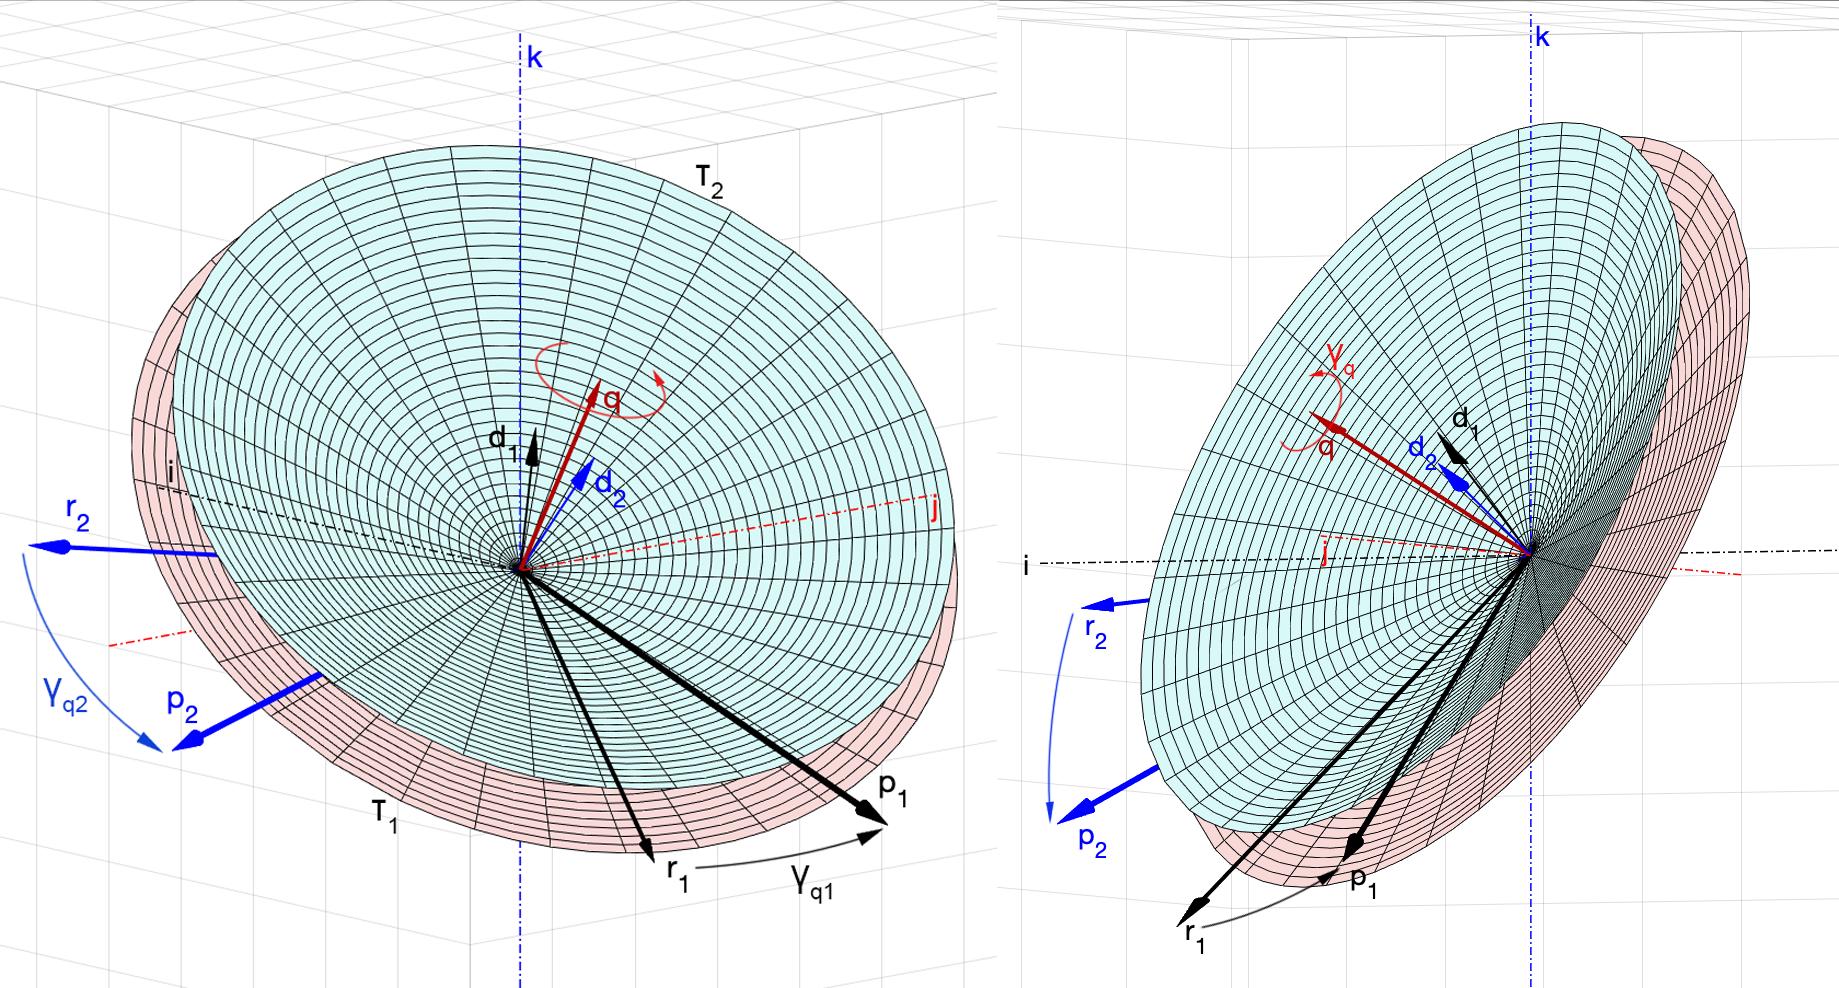 Рис. 5. Геометрия задачи